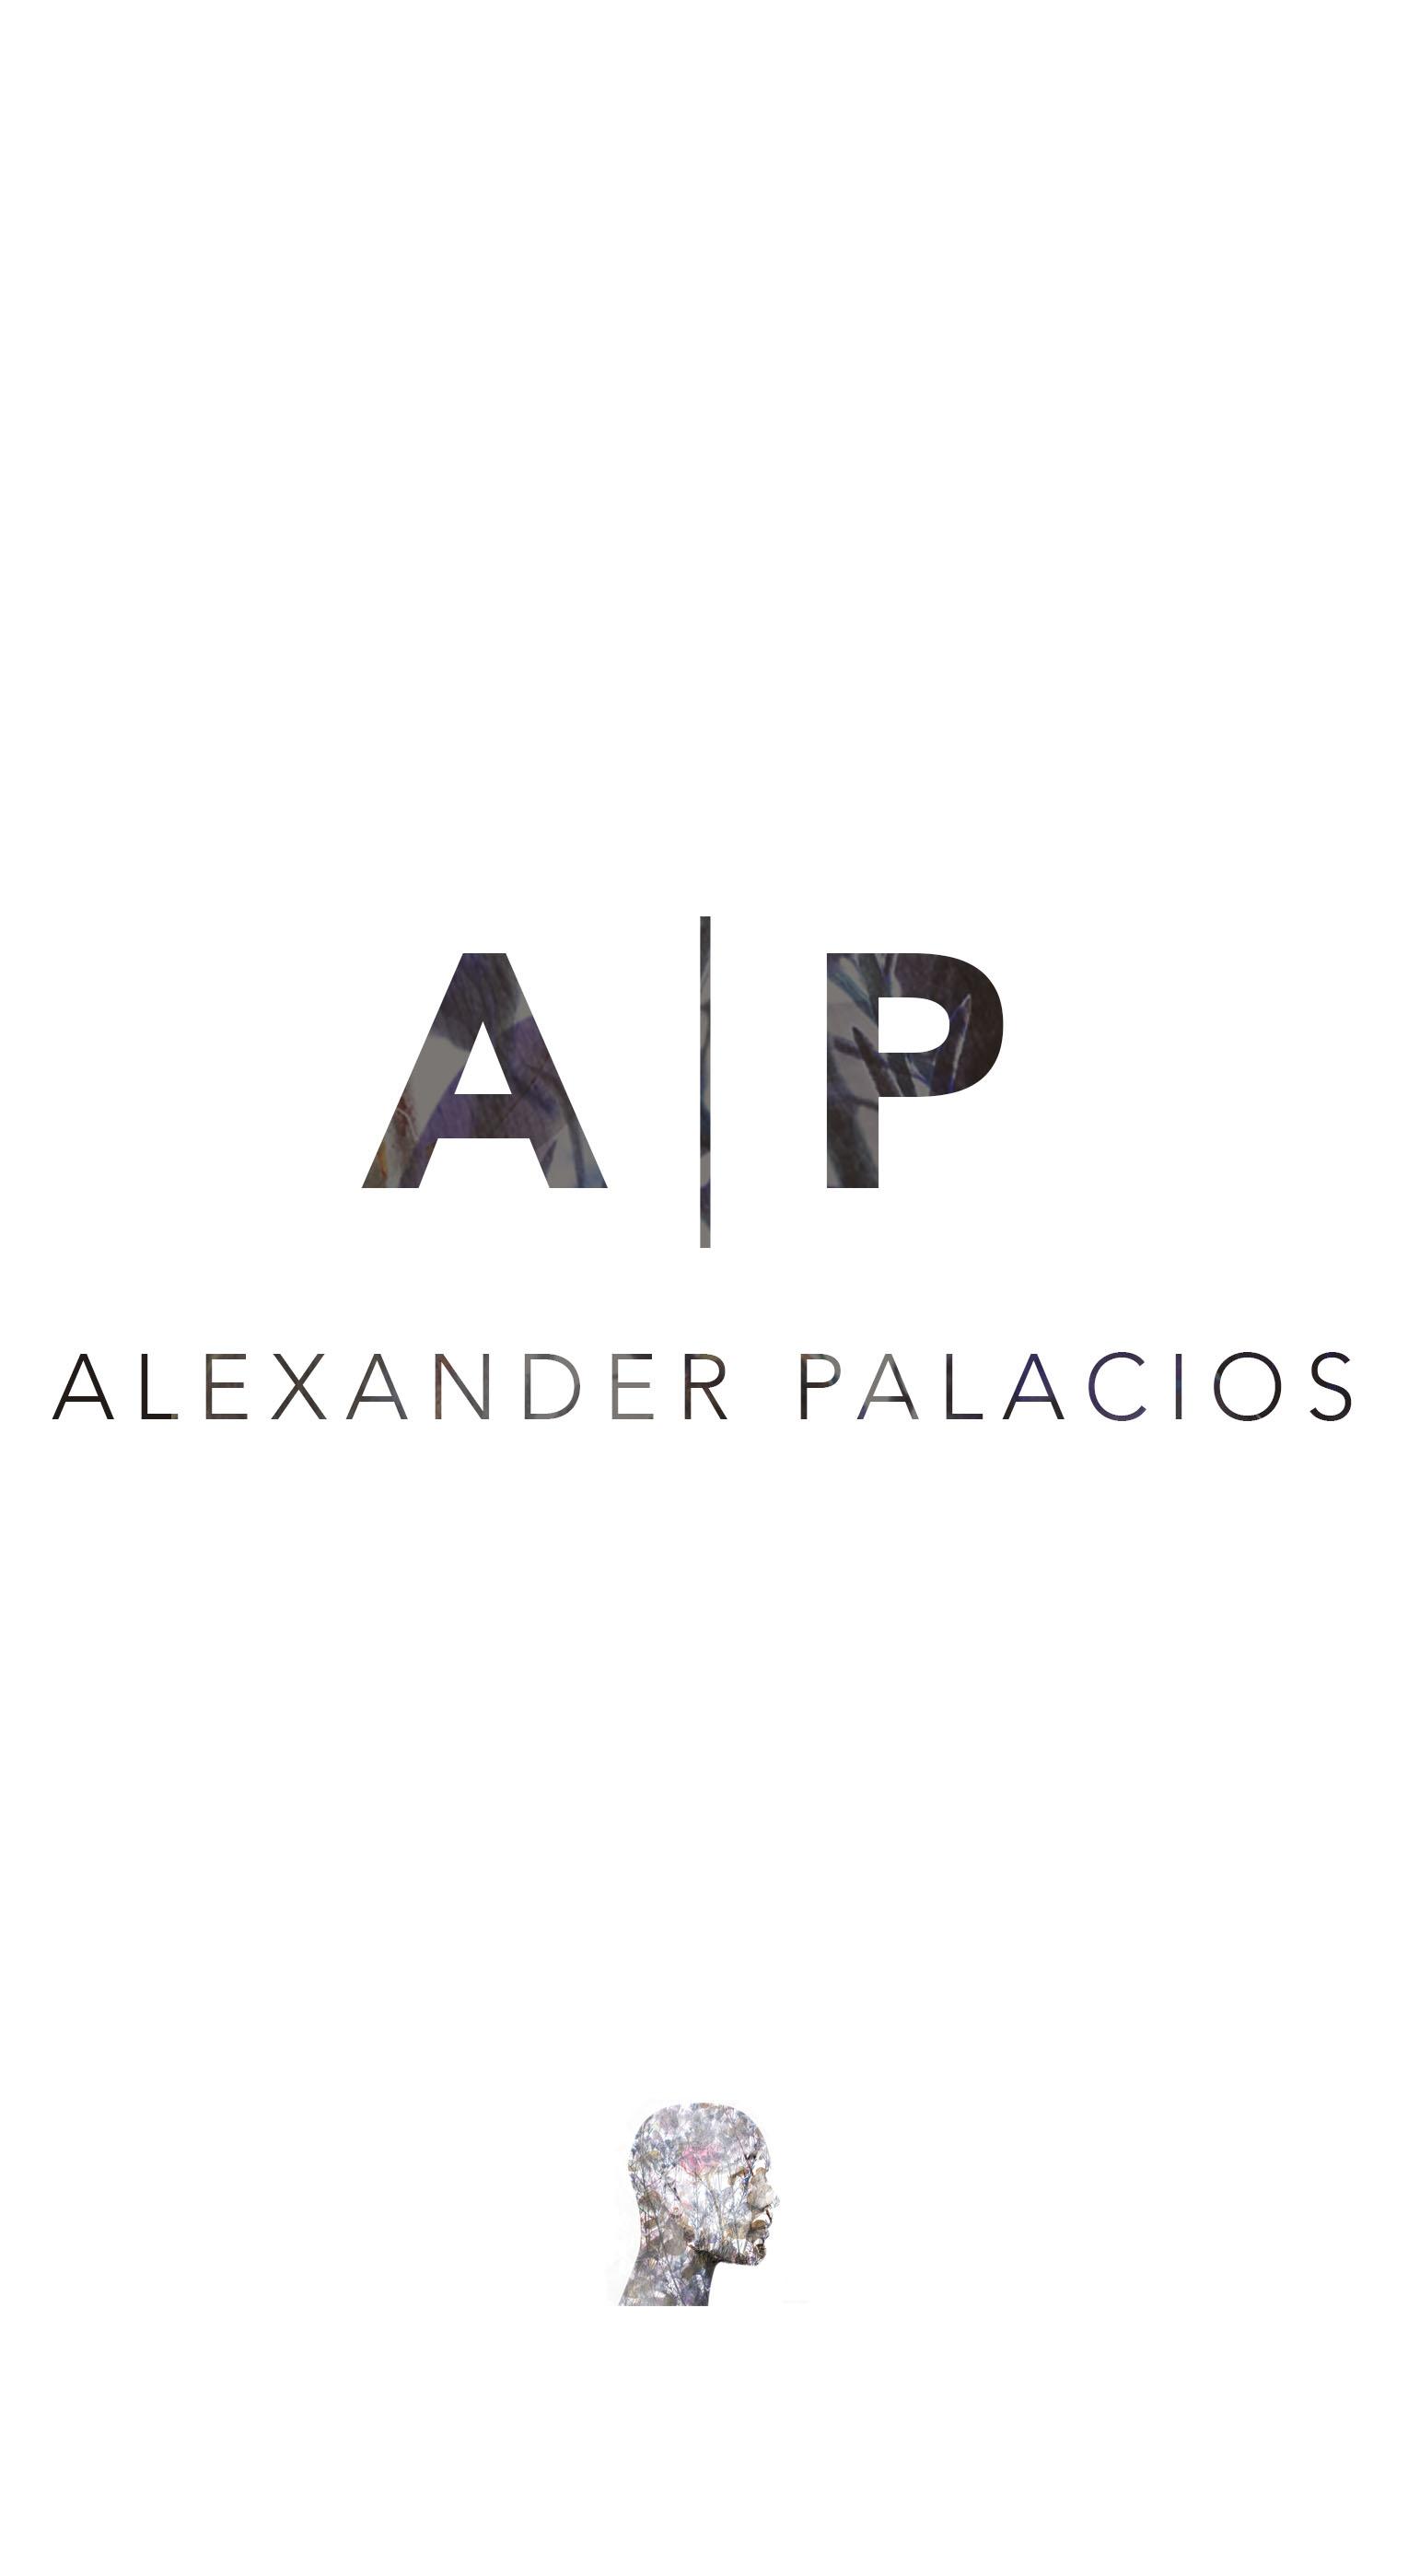 Alexander Palacios